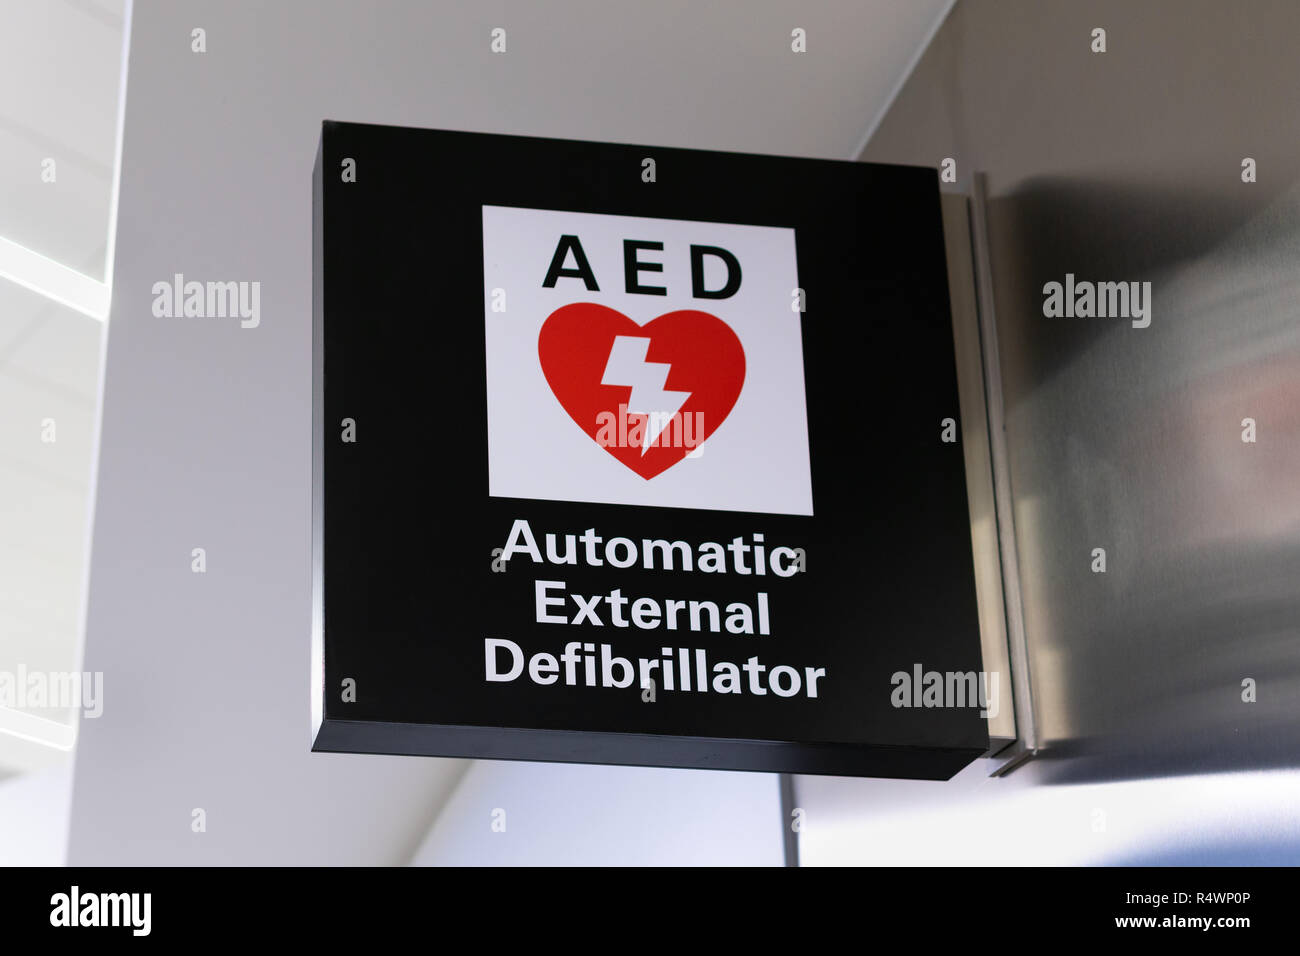 SAN FRANCISCO, CA/USA - OCTOBER 10, 2018: Automatic External Defibrillator sign and logo. - Stock Image